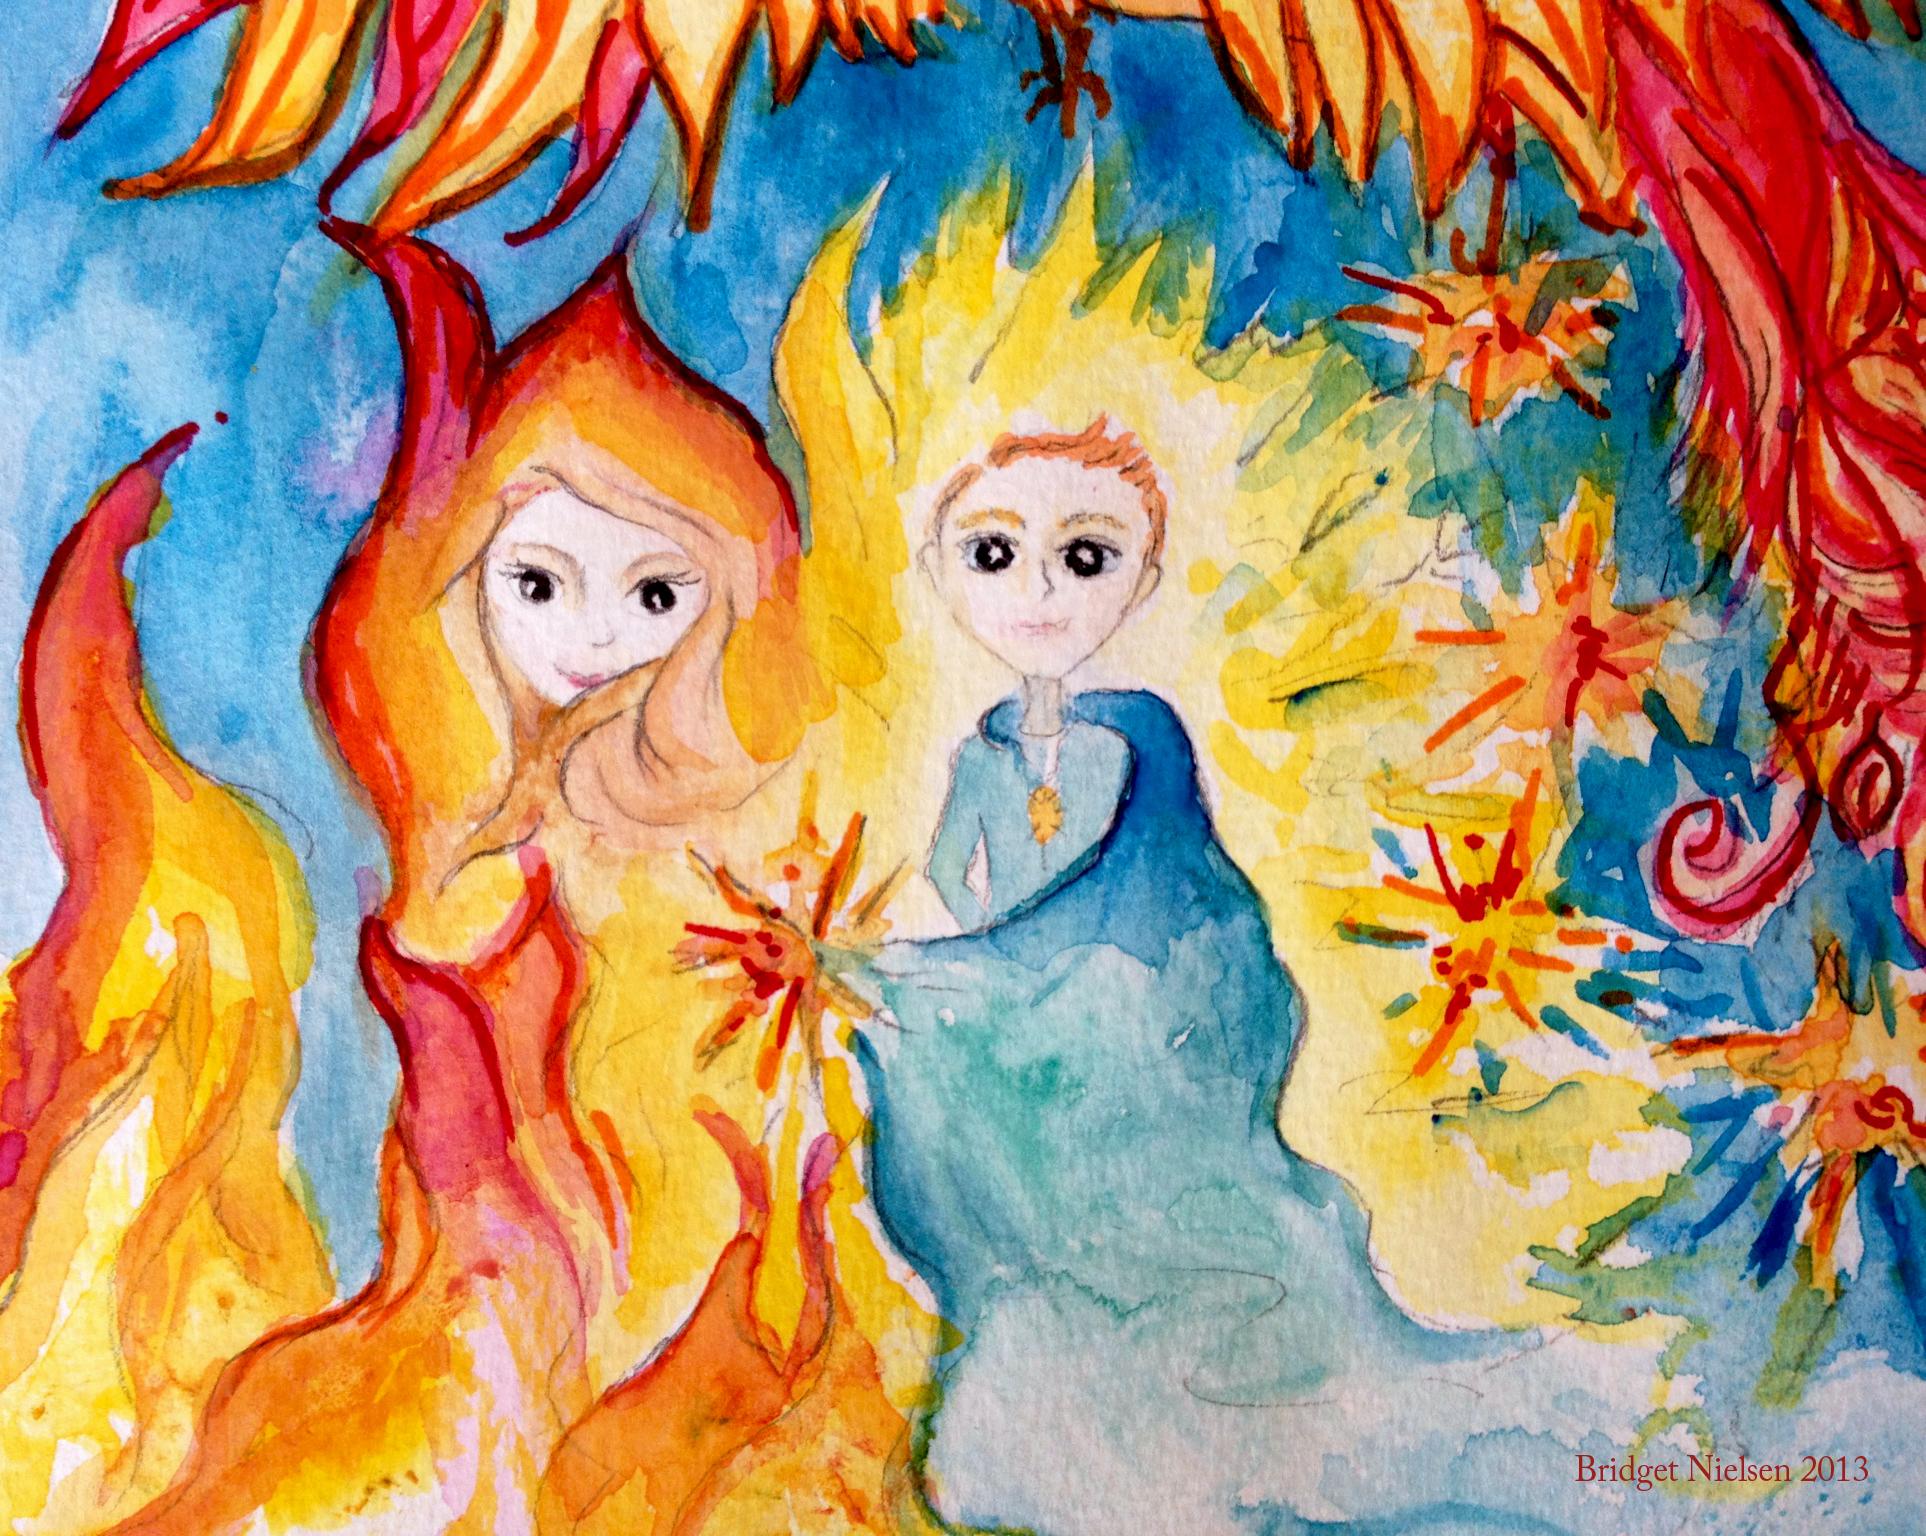 Spark&FlameFB